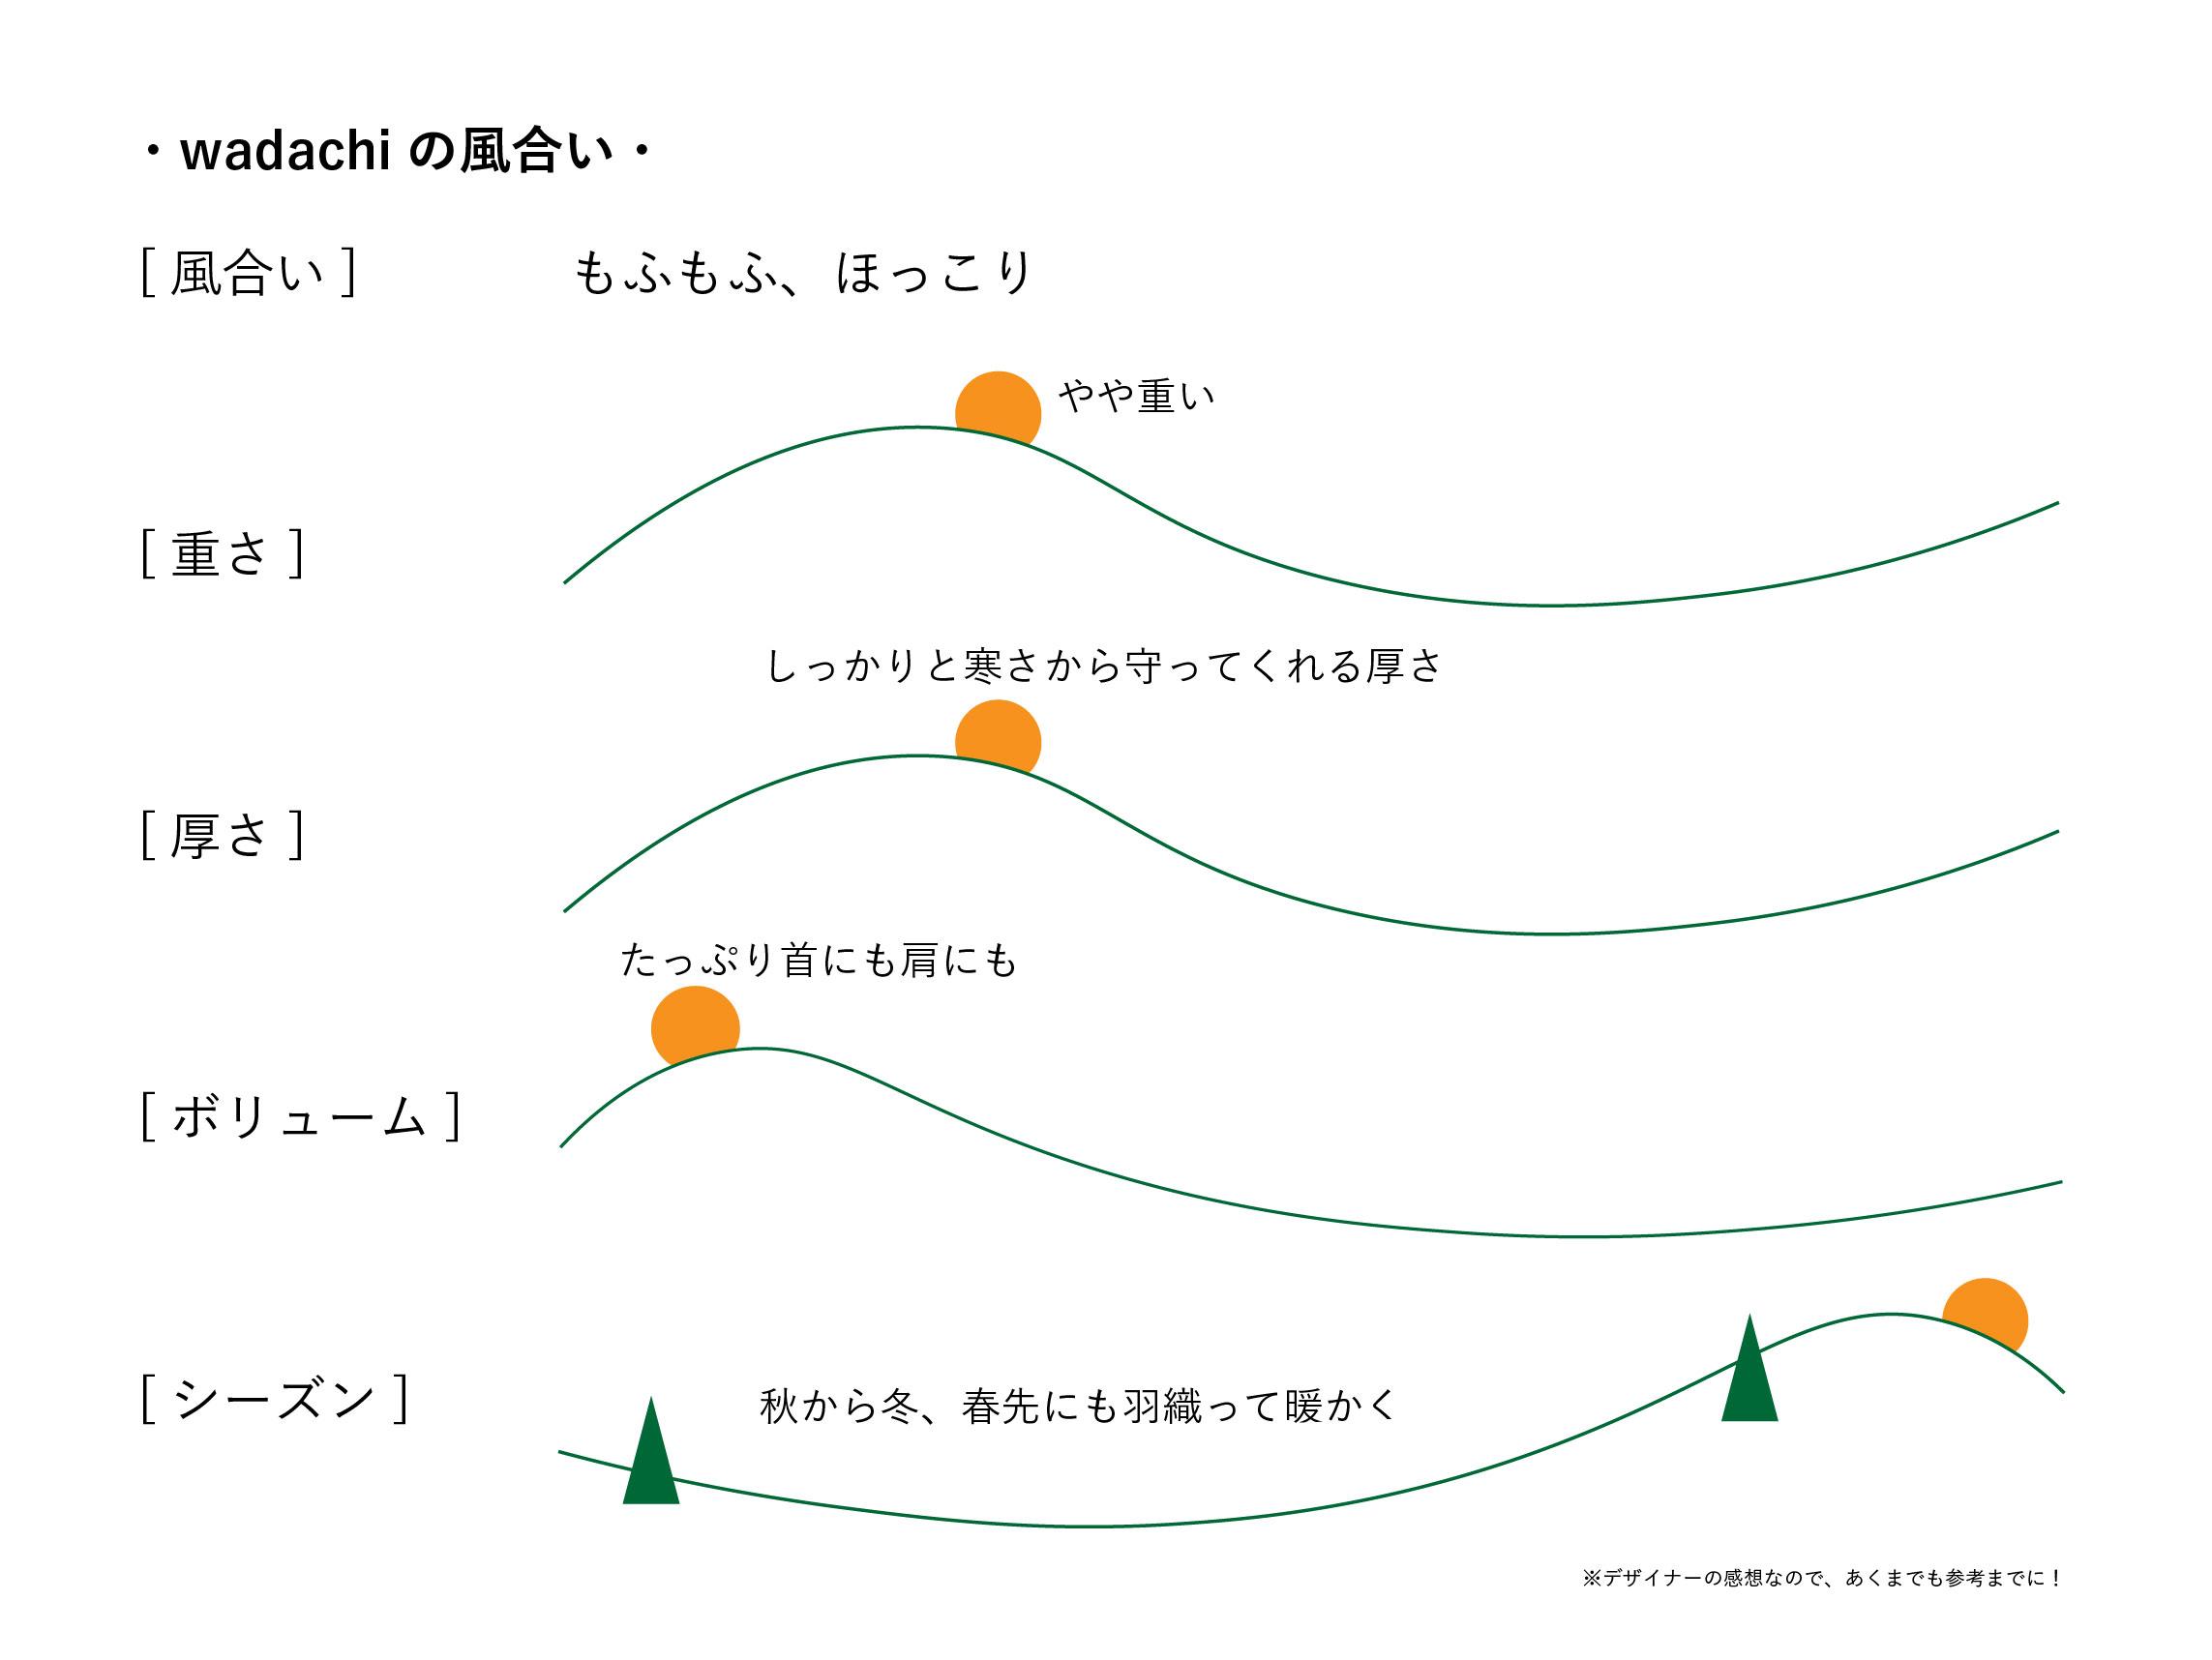 wadachi(top)